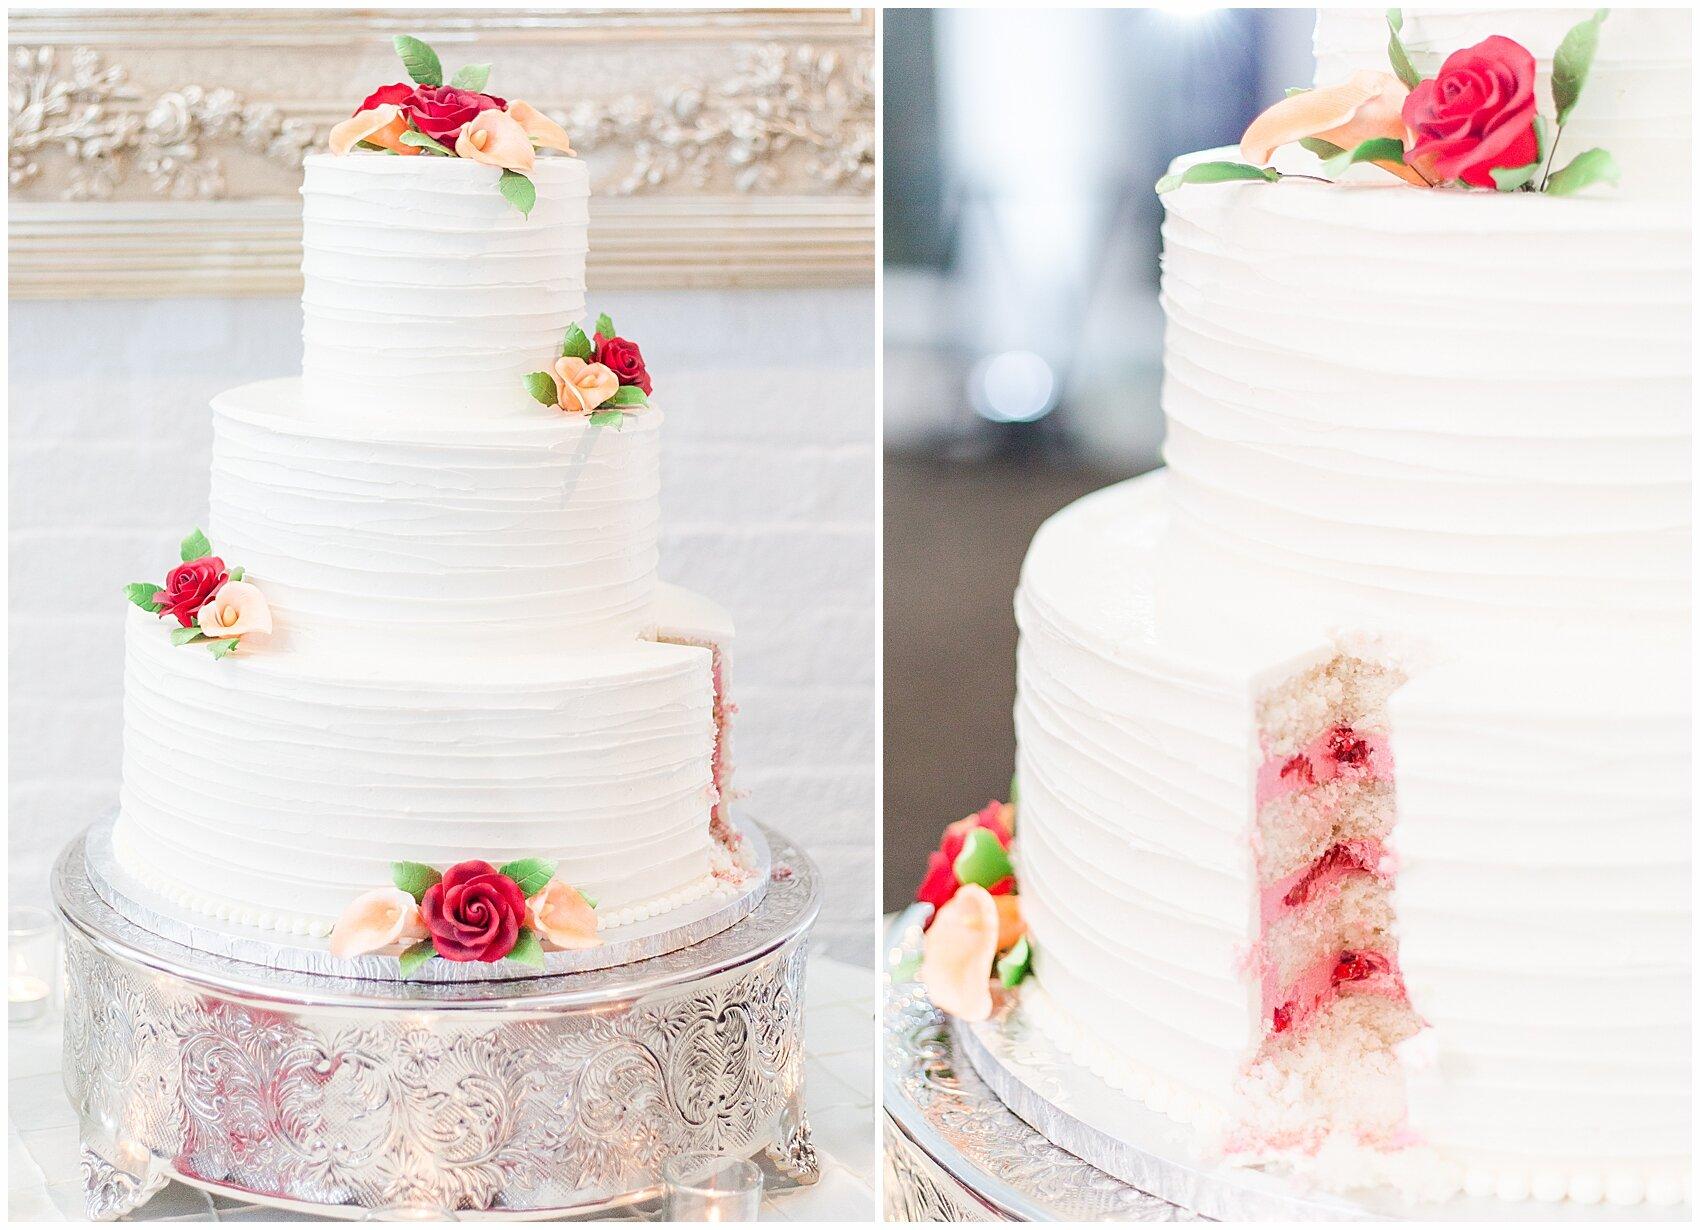 HOW-TO-CUT-A-WEDDING-CAKE_0005.jpg